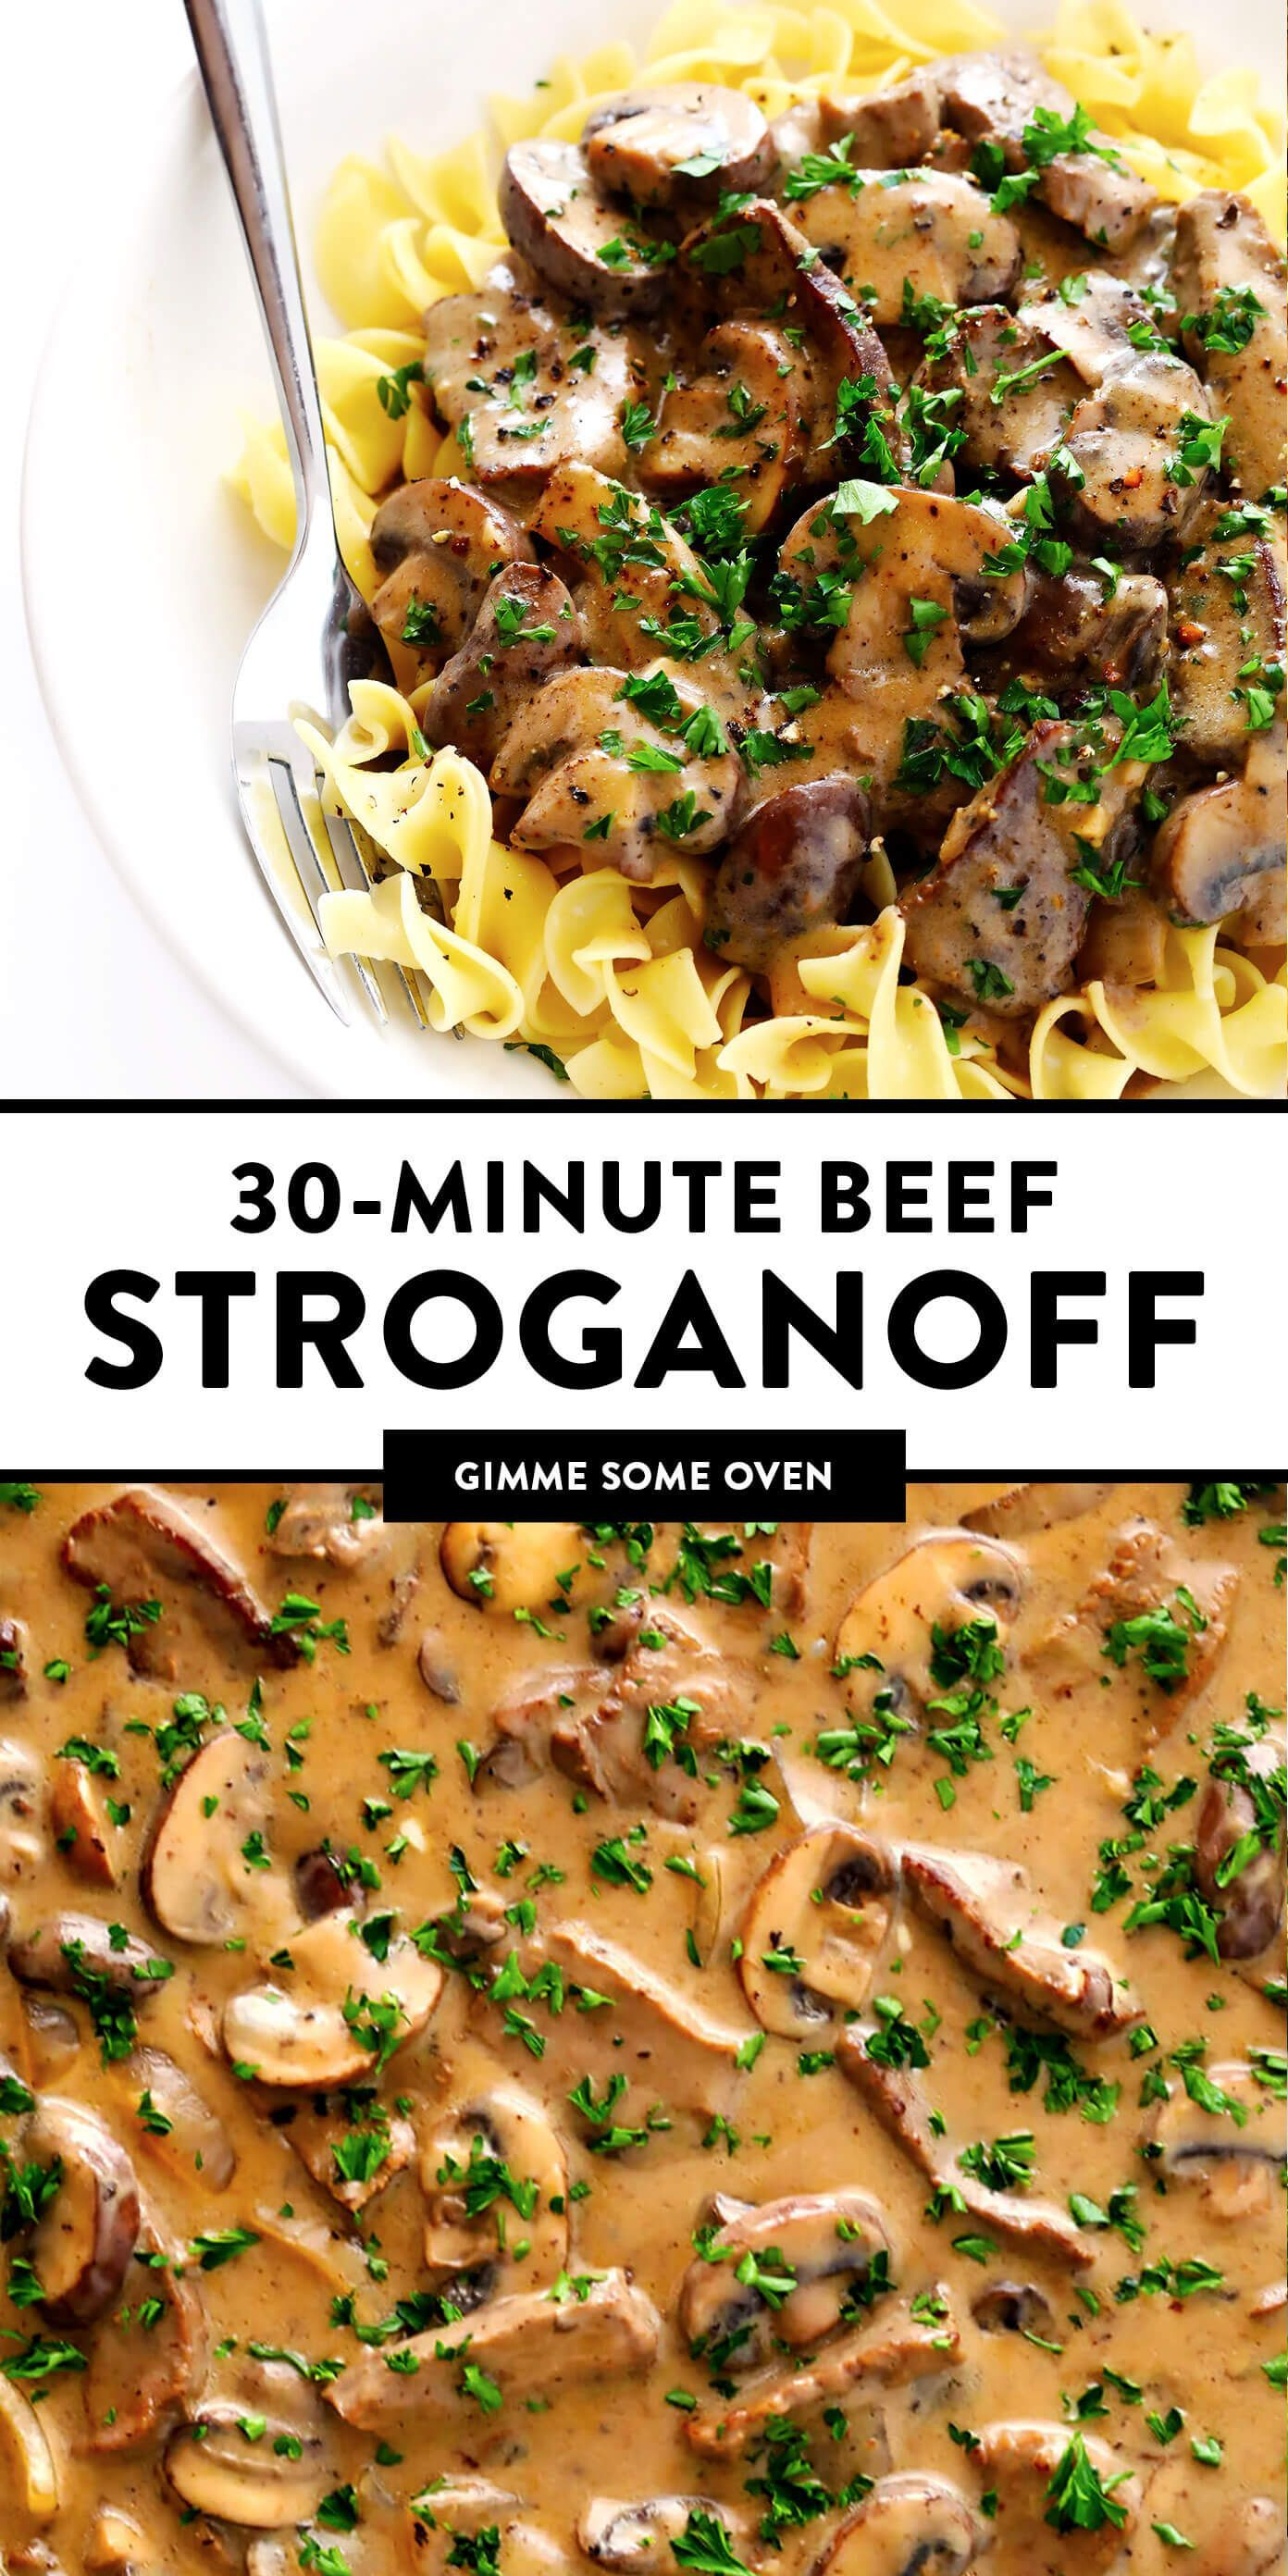 The Best Beef Stroganoff Recipe Gimme Some Oven Recipe Stroganoff Recipe Beef Stroganoff Easy Best Beef Stroganoff